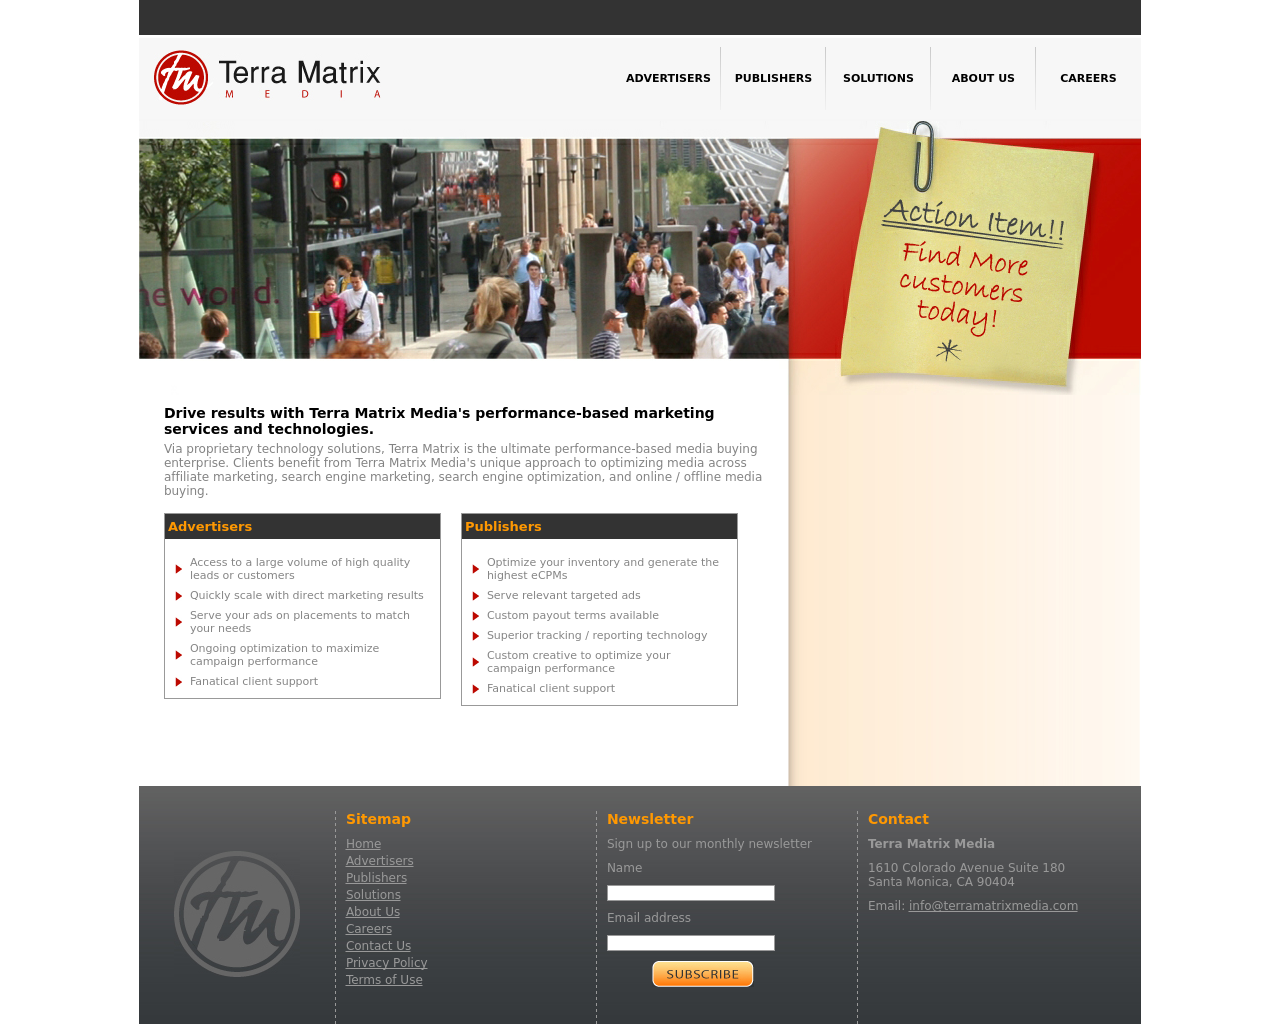 Terra-Matrix-Media-Advertising-Reviews-Pricing